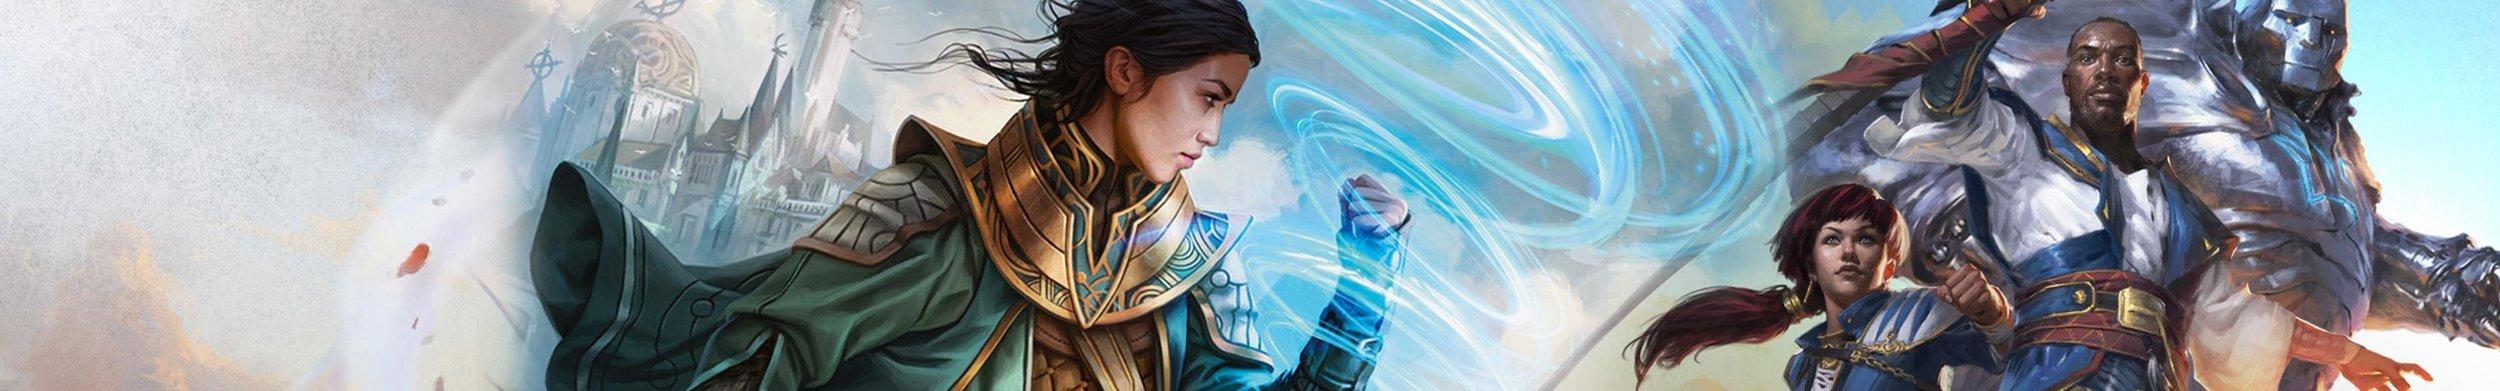 Magic-the-Gathering-Dominaria-Banner-04@2x.jpg